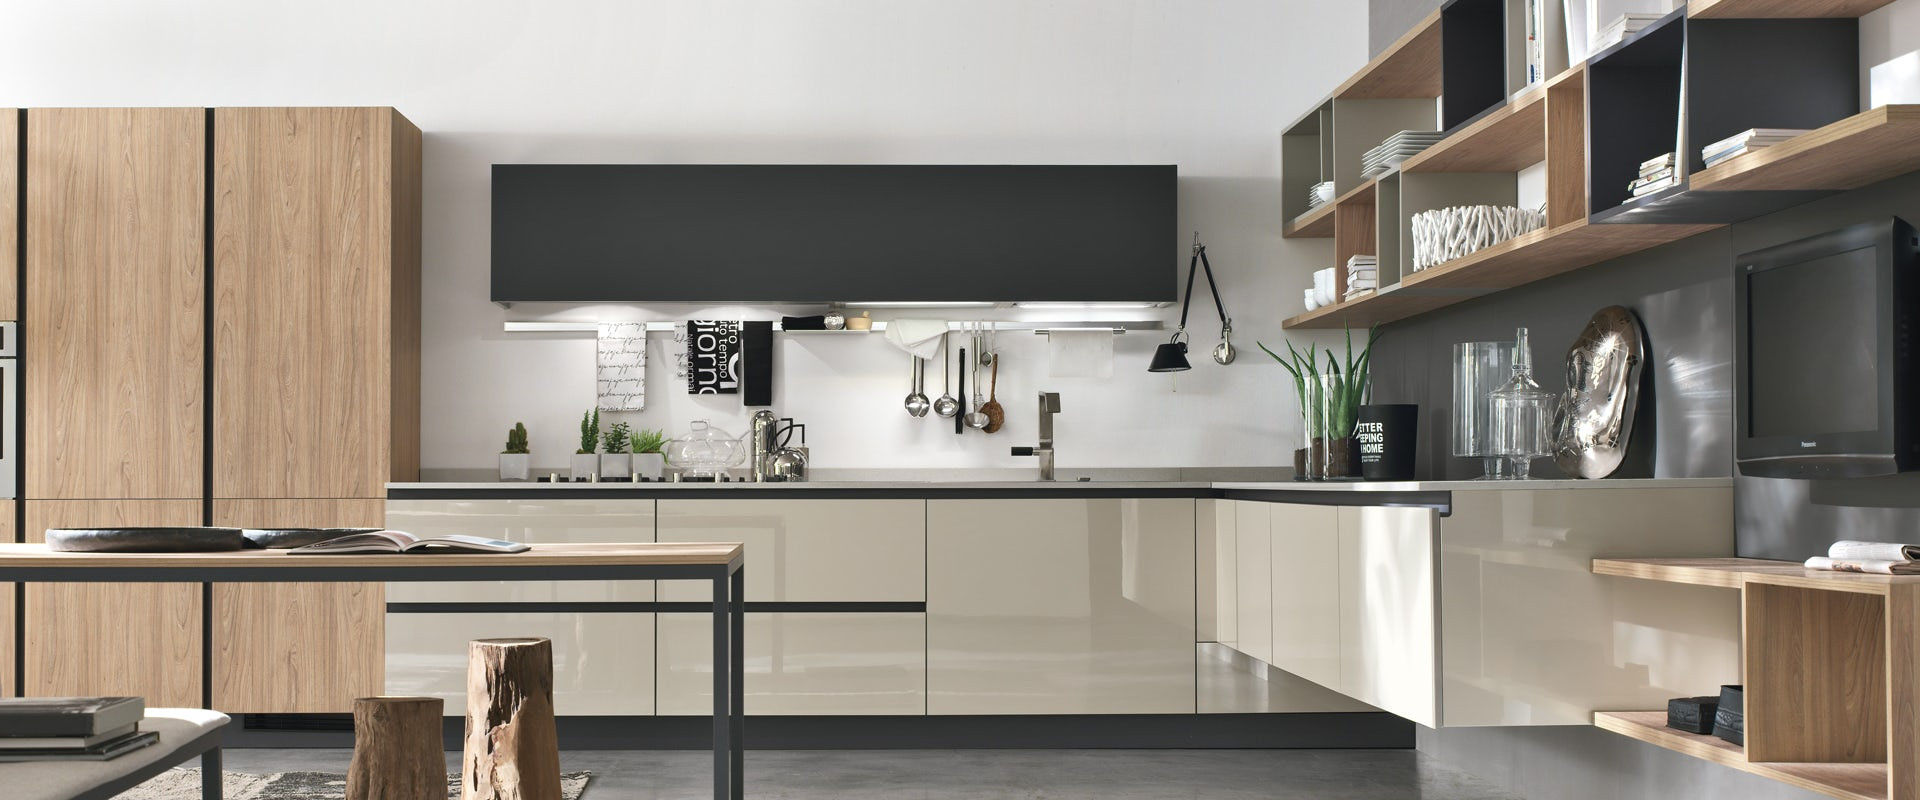 stosa-cucine-moderne-aleve-113.jpg